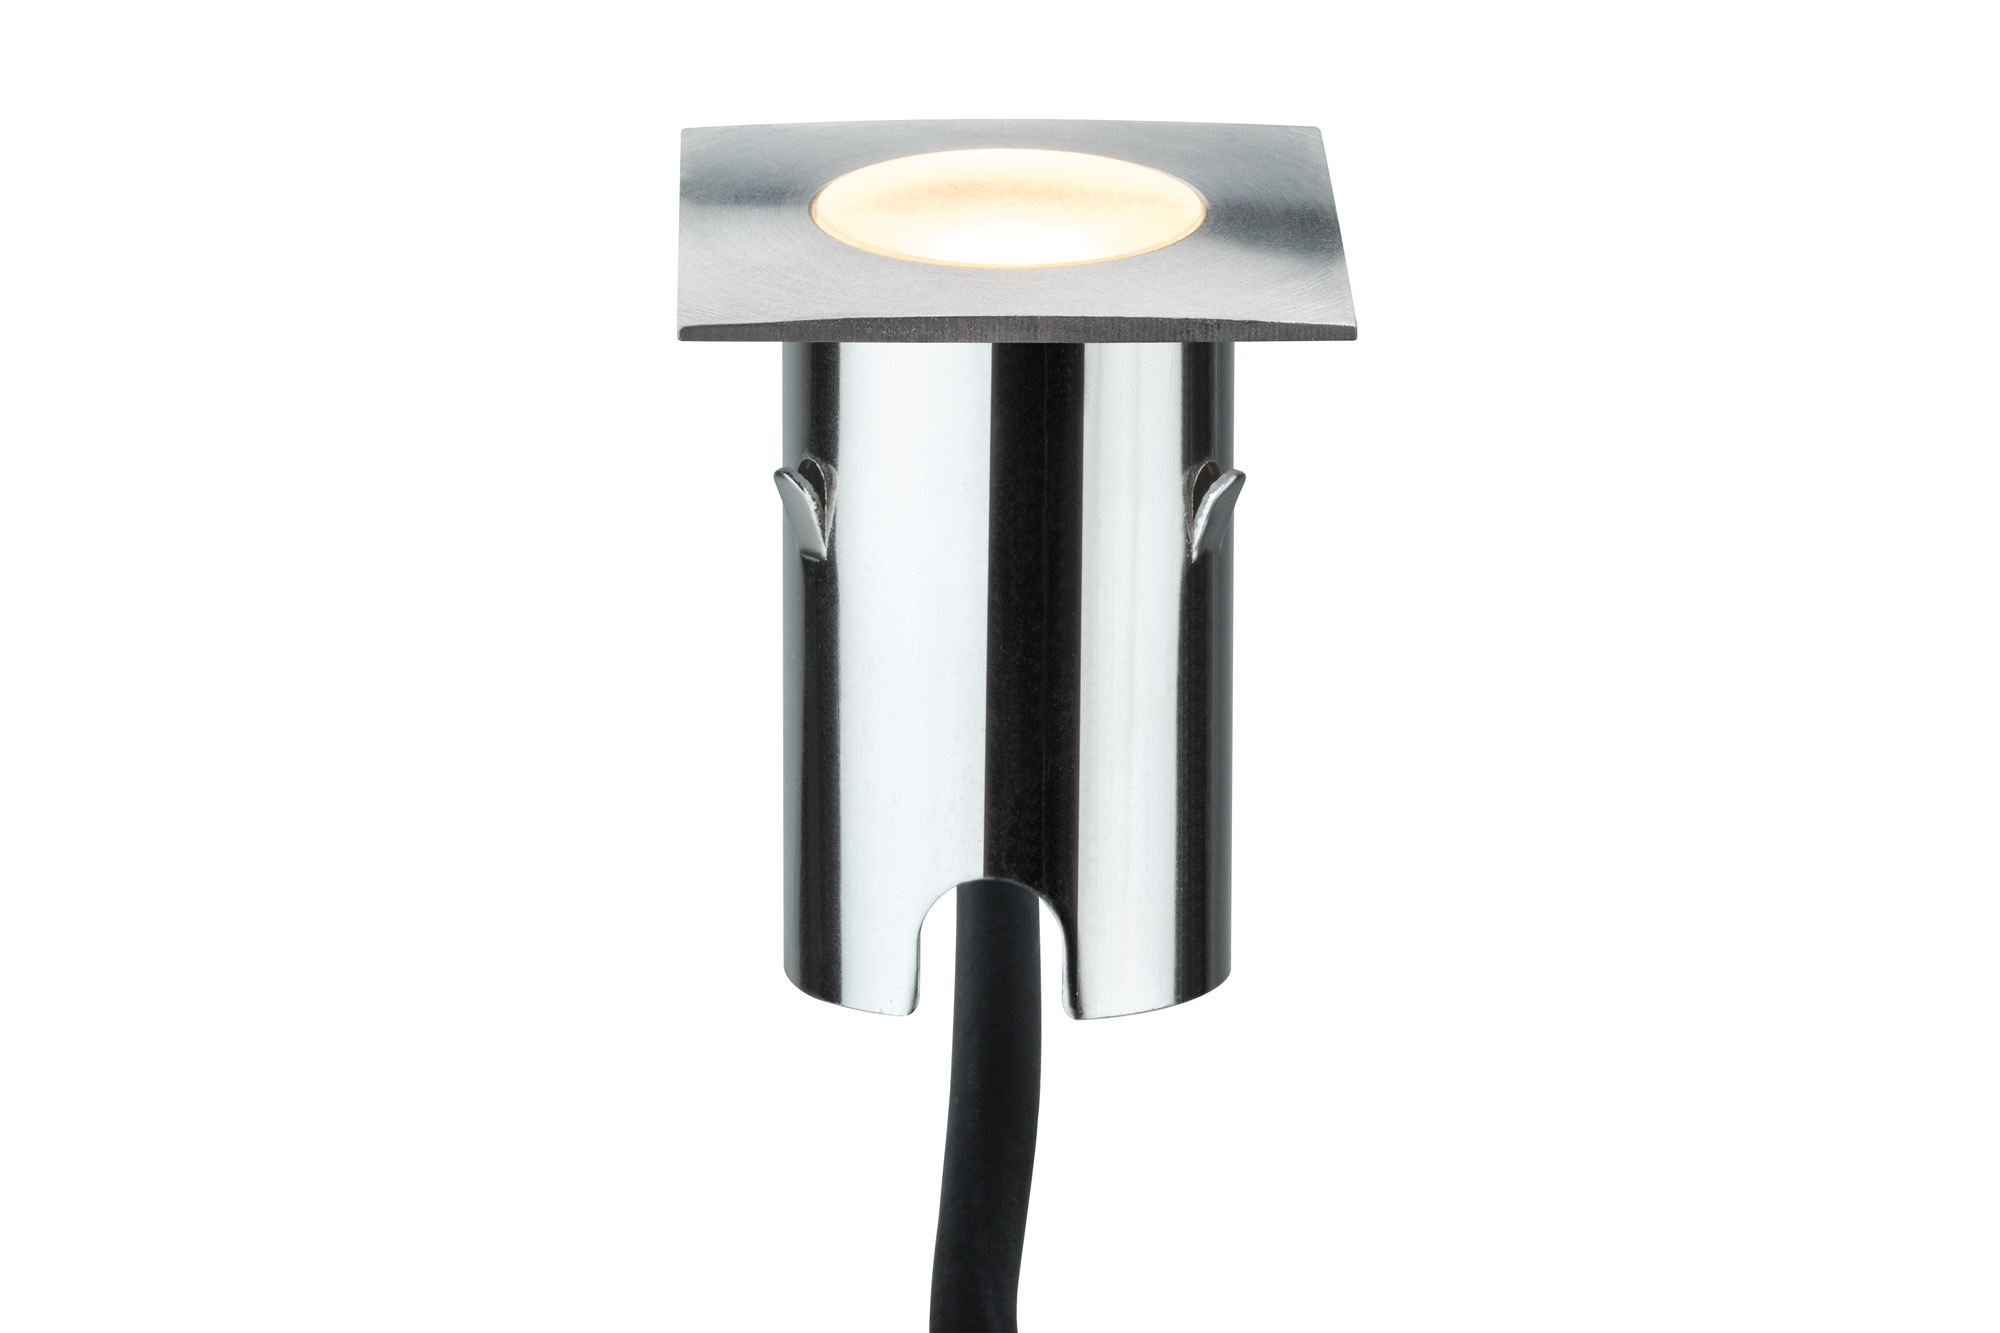 Paulmann. 93785 Набор светильников MiniBoden EBLeckig IP67 Erg.Set 4x1W Est